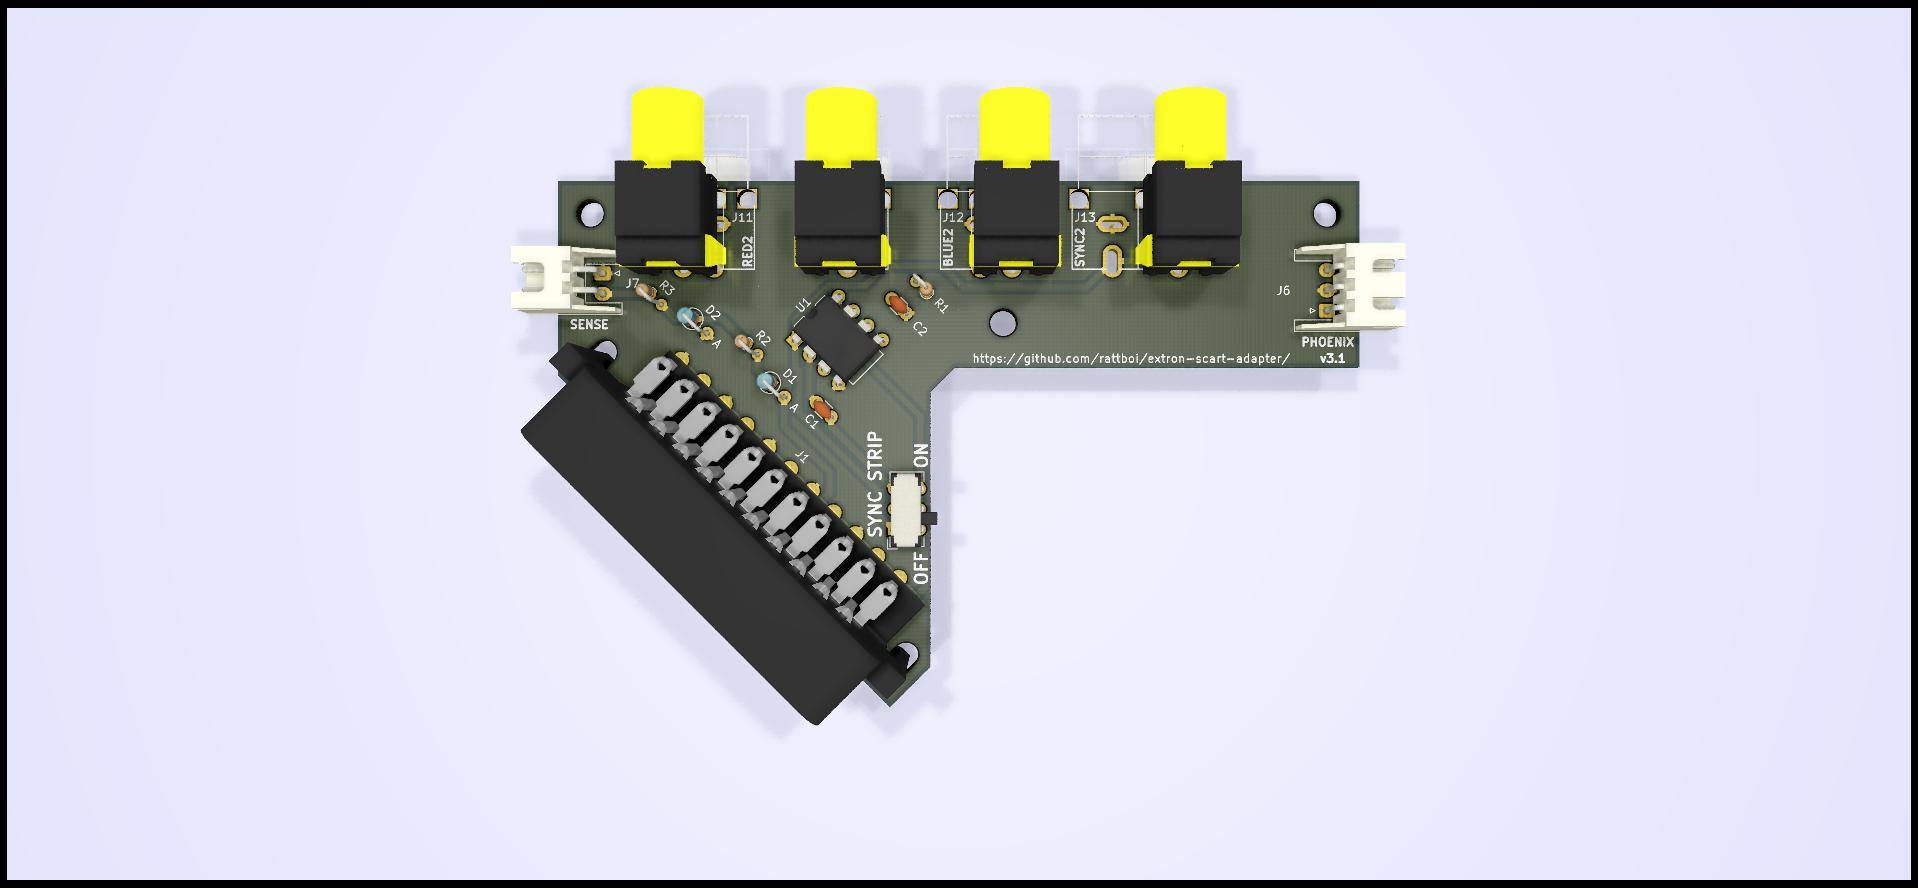 Extron SCART input/output Adapter PCB